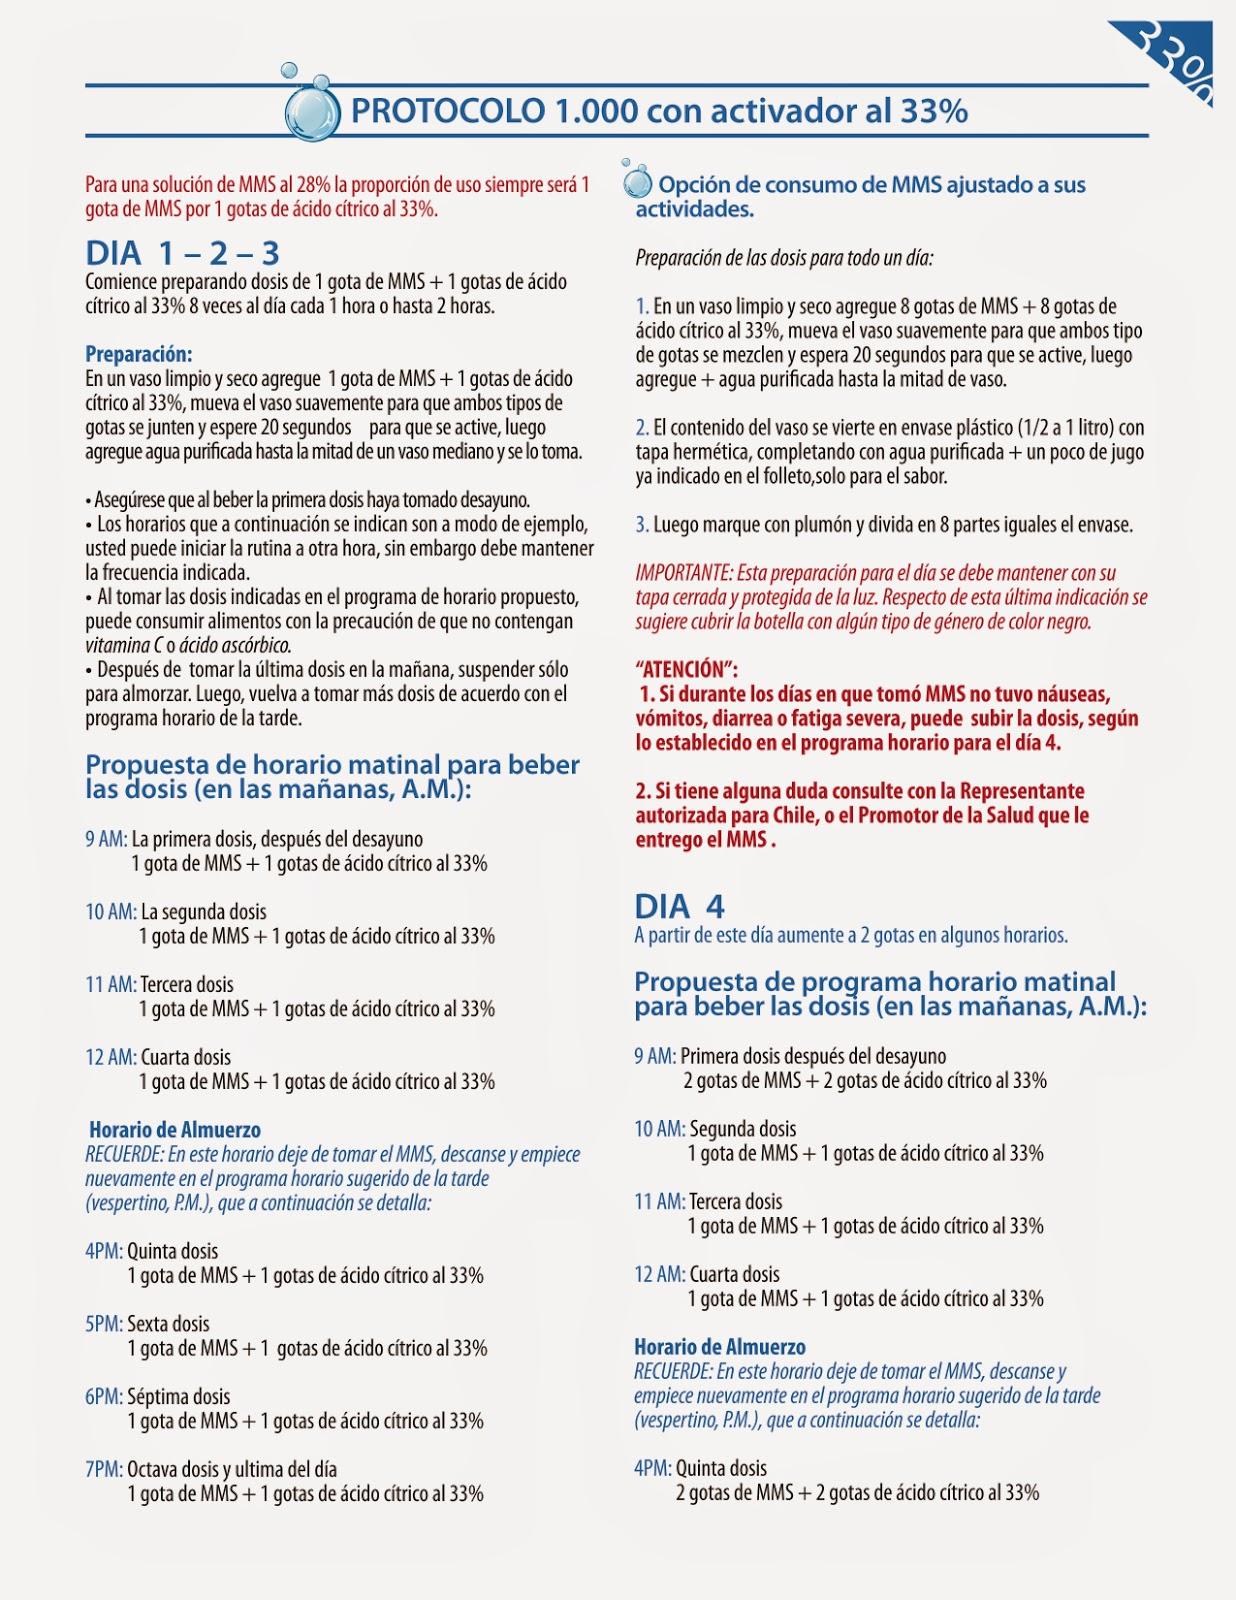 mms, mms chile, mms cáncer, clorito de sodio, dióxido de cloro, mms dióxido de cloro,protocolo 1.000,